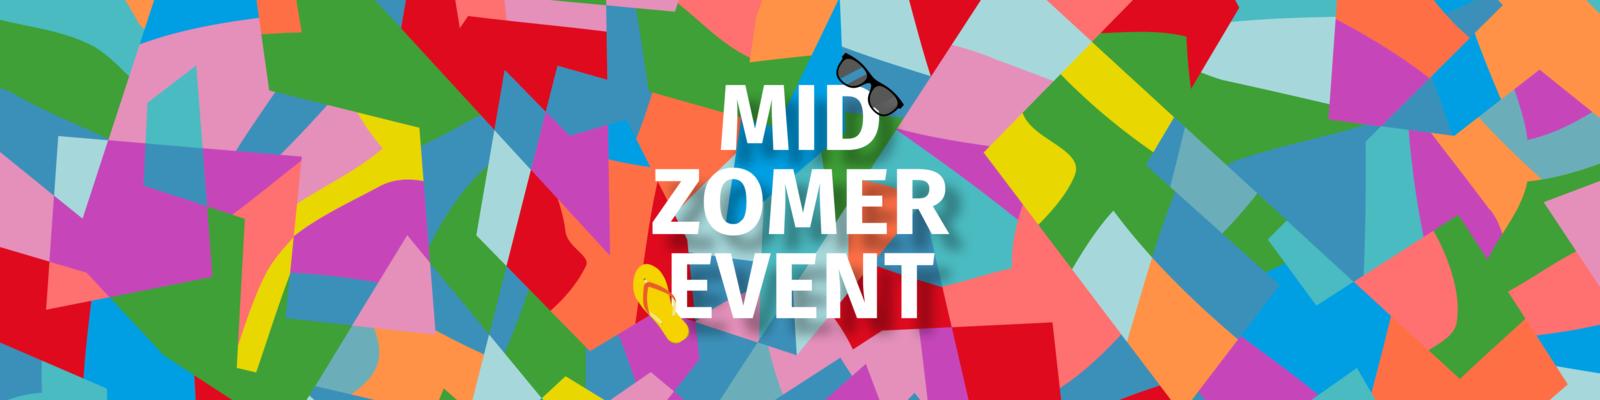 midzomer event gsiw header